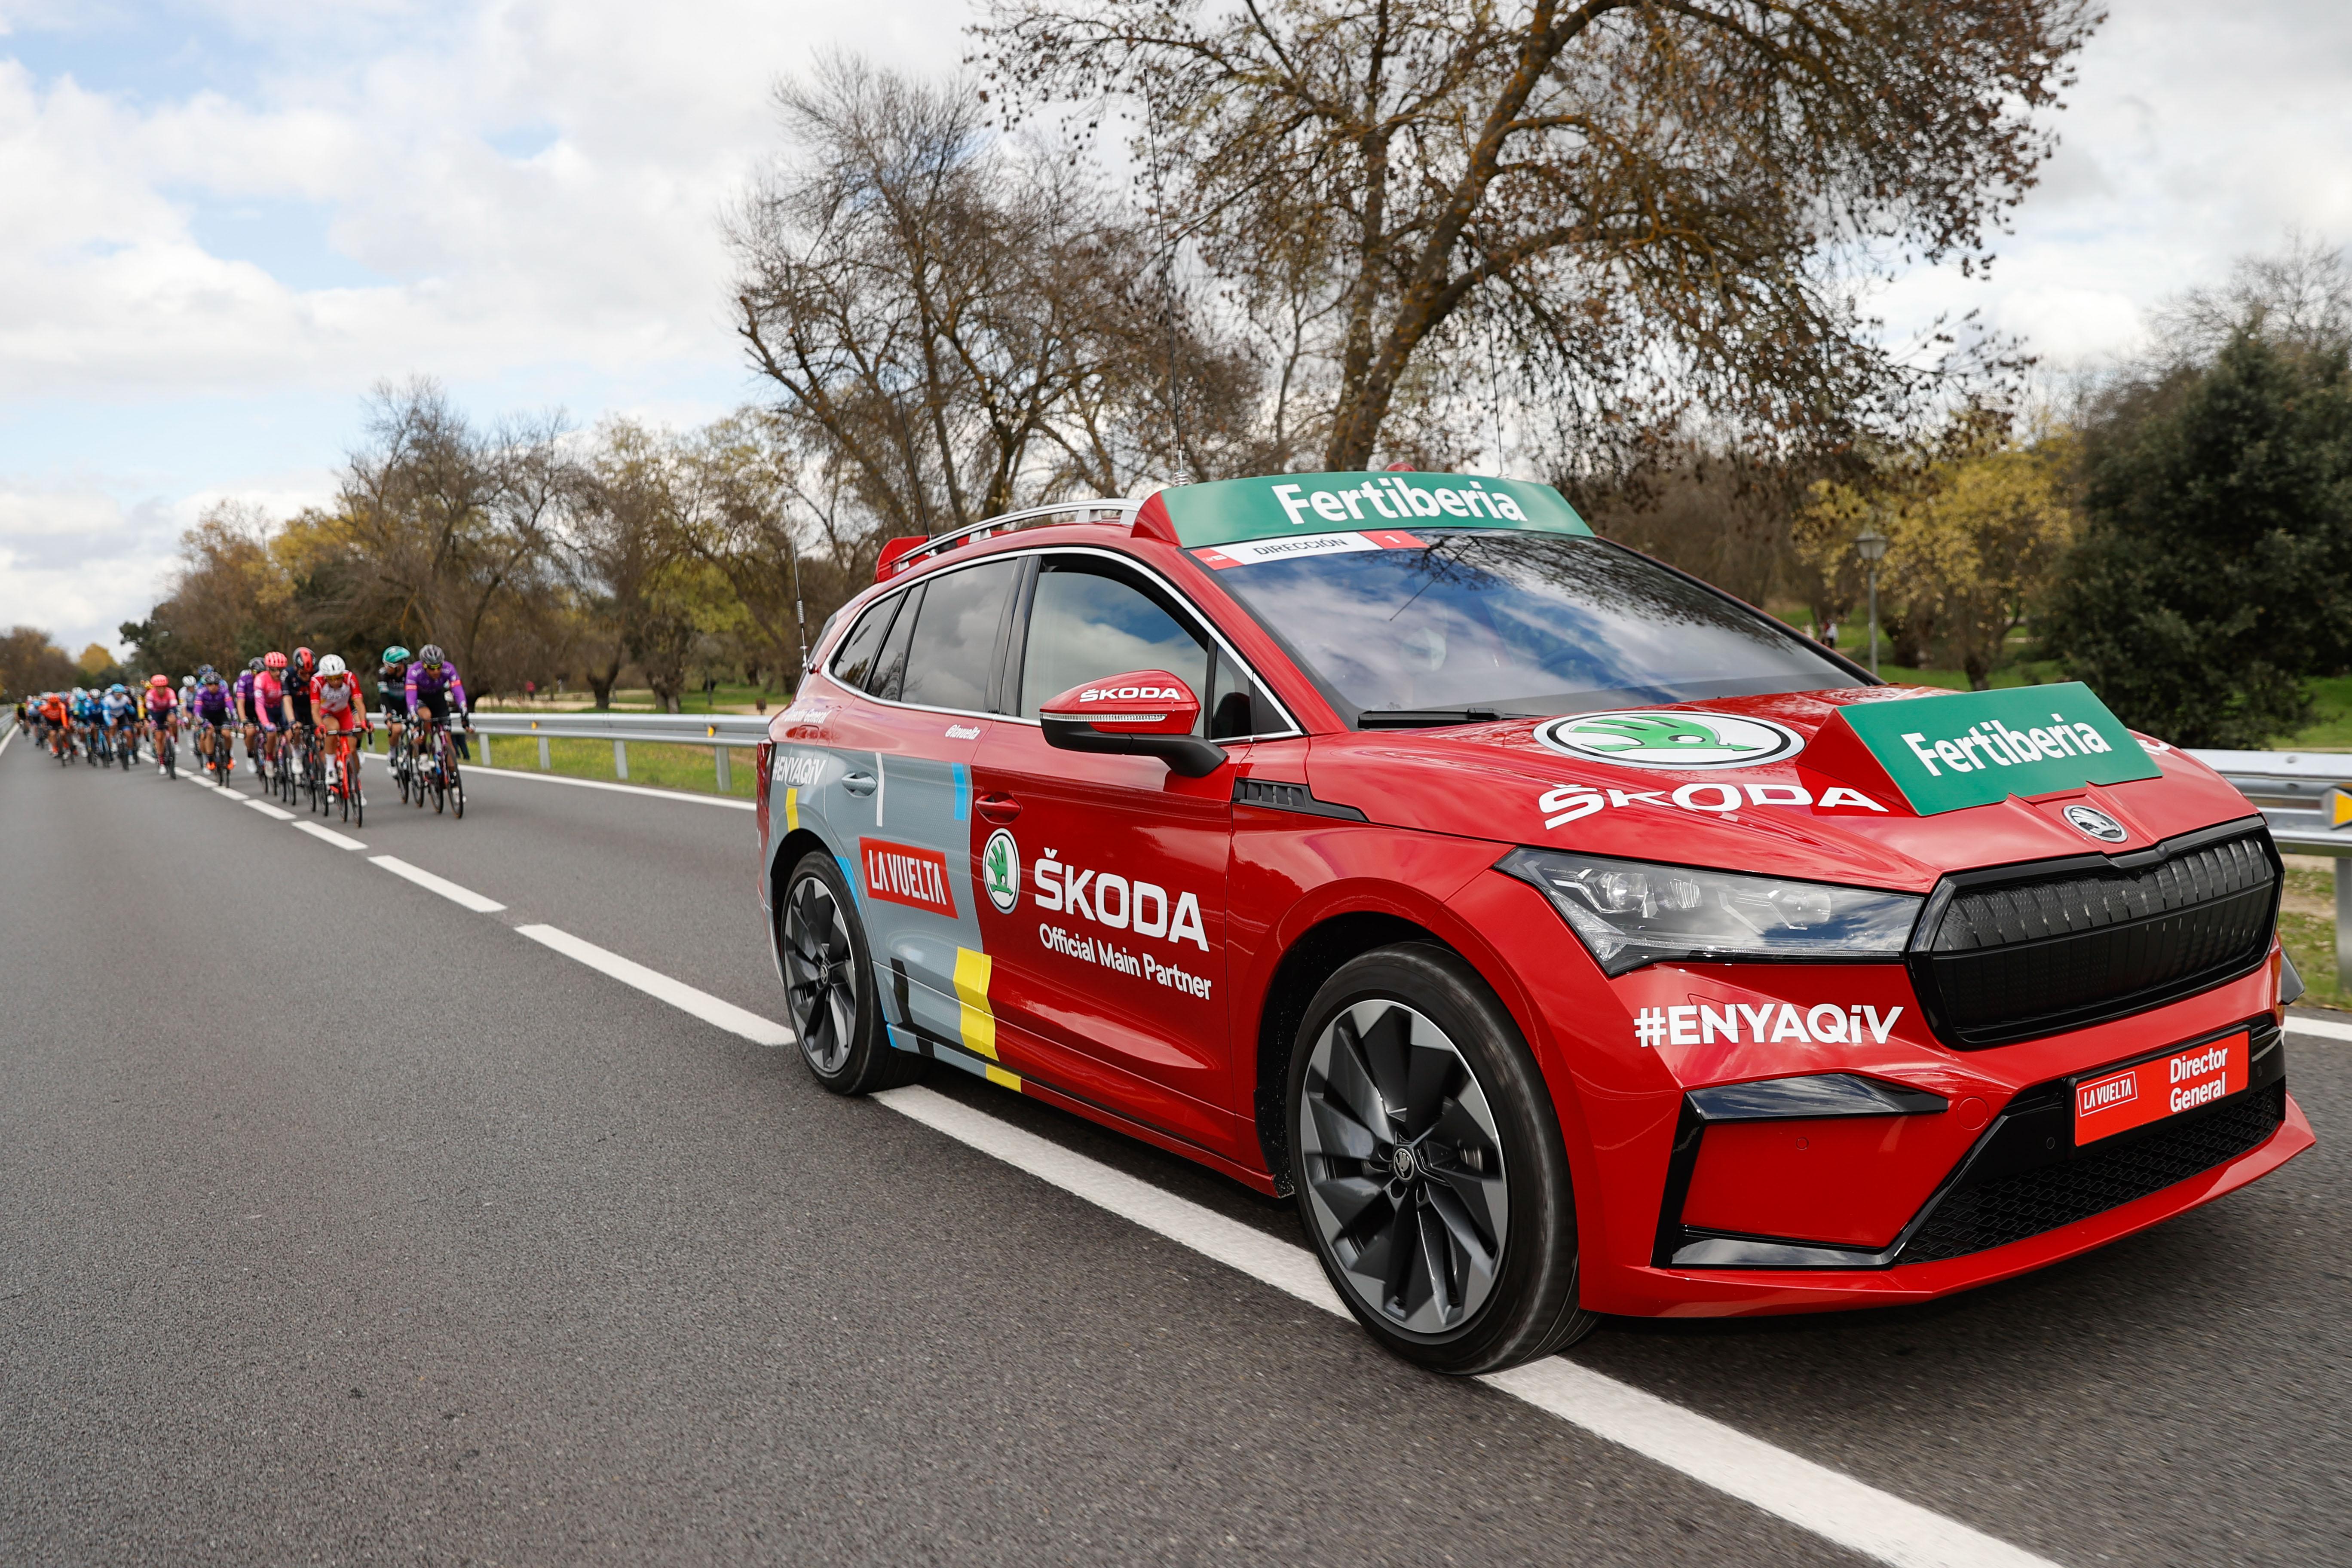 SKODA ENYAQ iV led three stages of Spanish cycling tour La Vuelta - Image 1